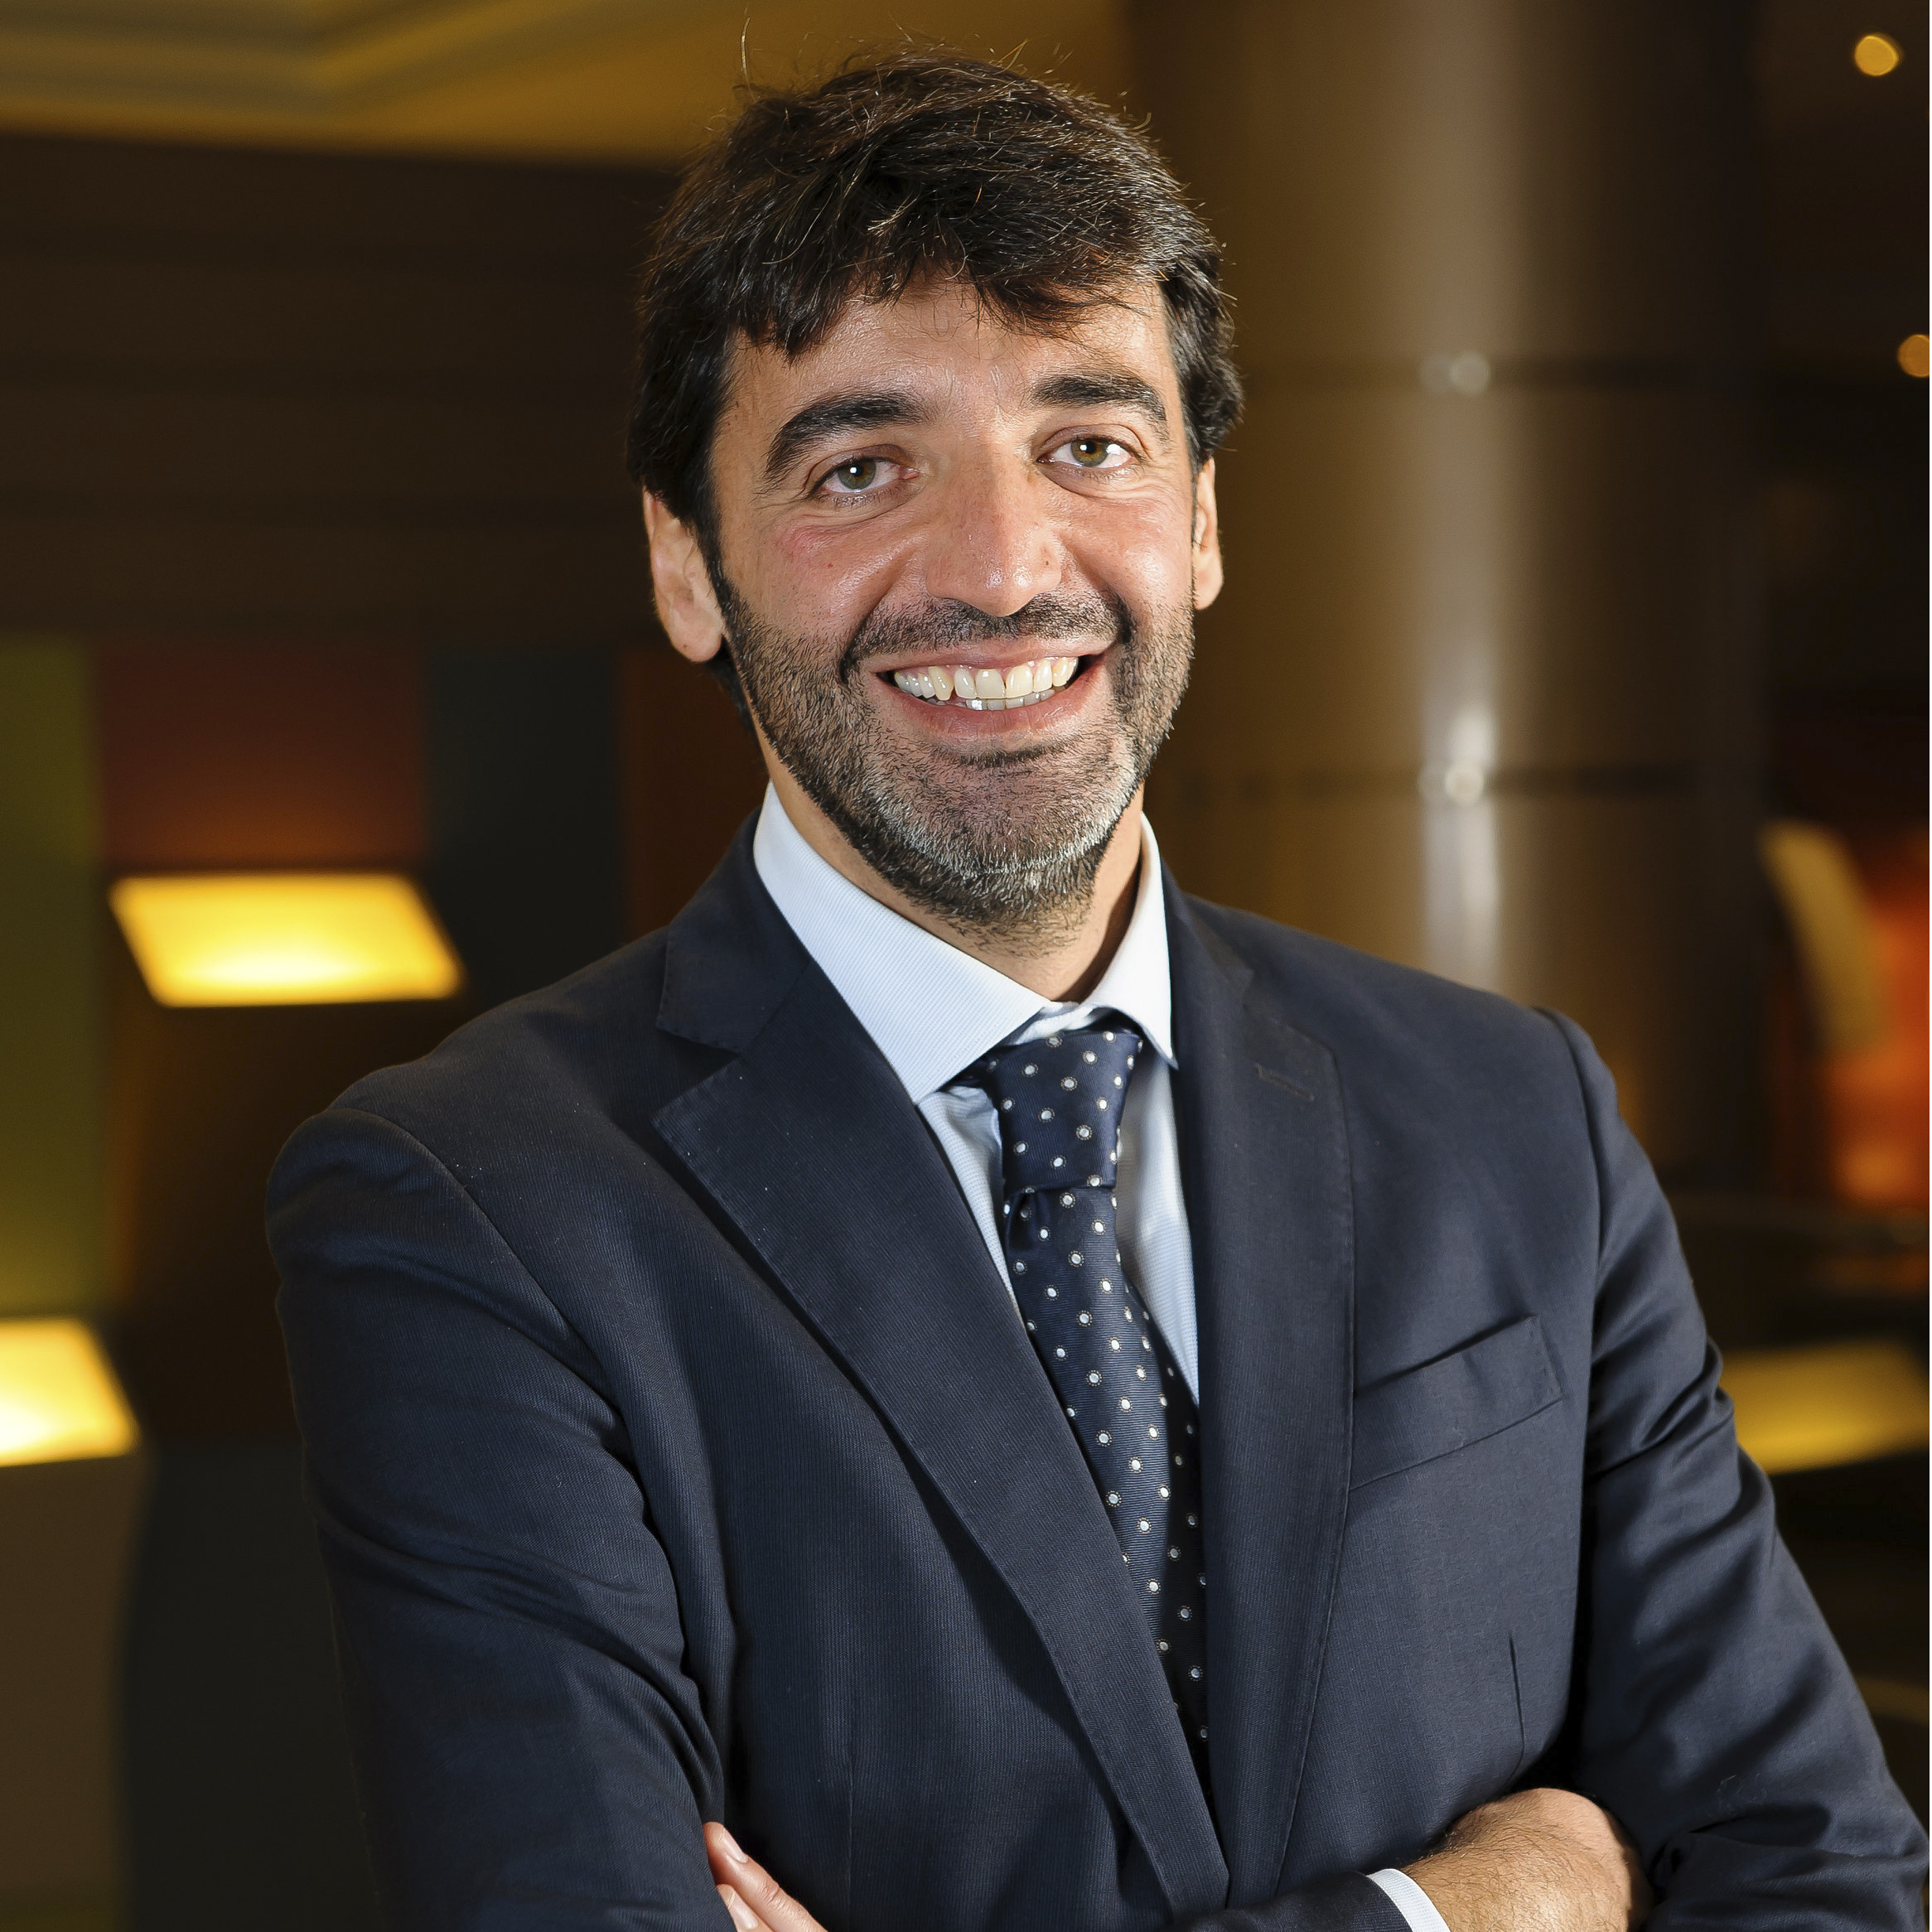 Albert Grau Vidal